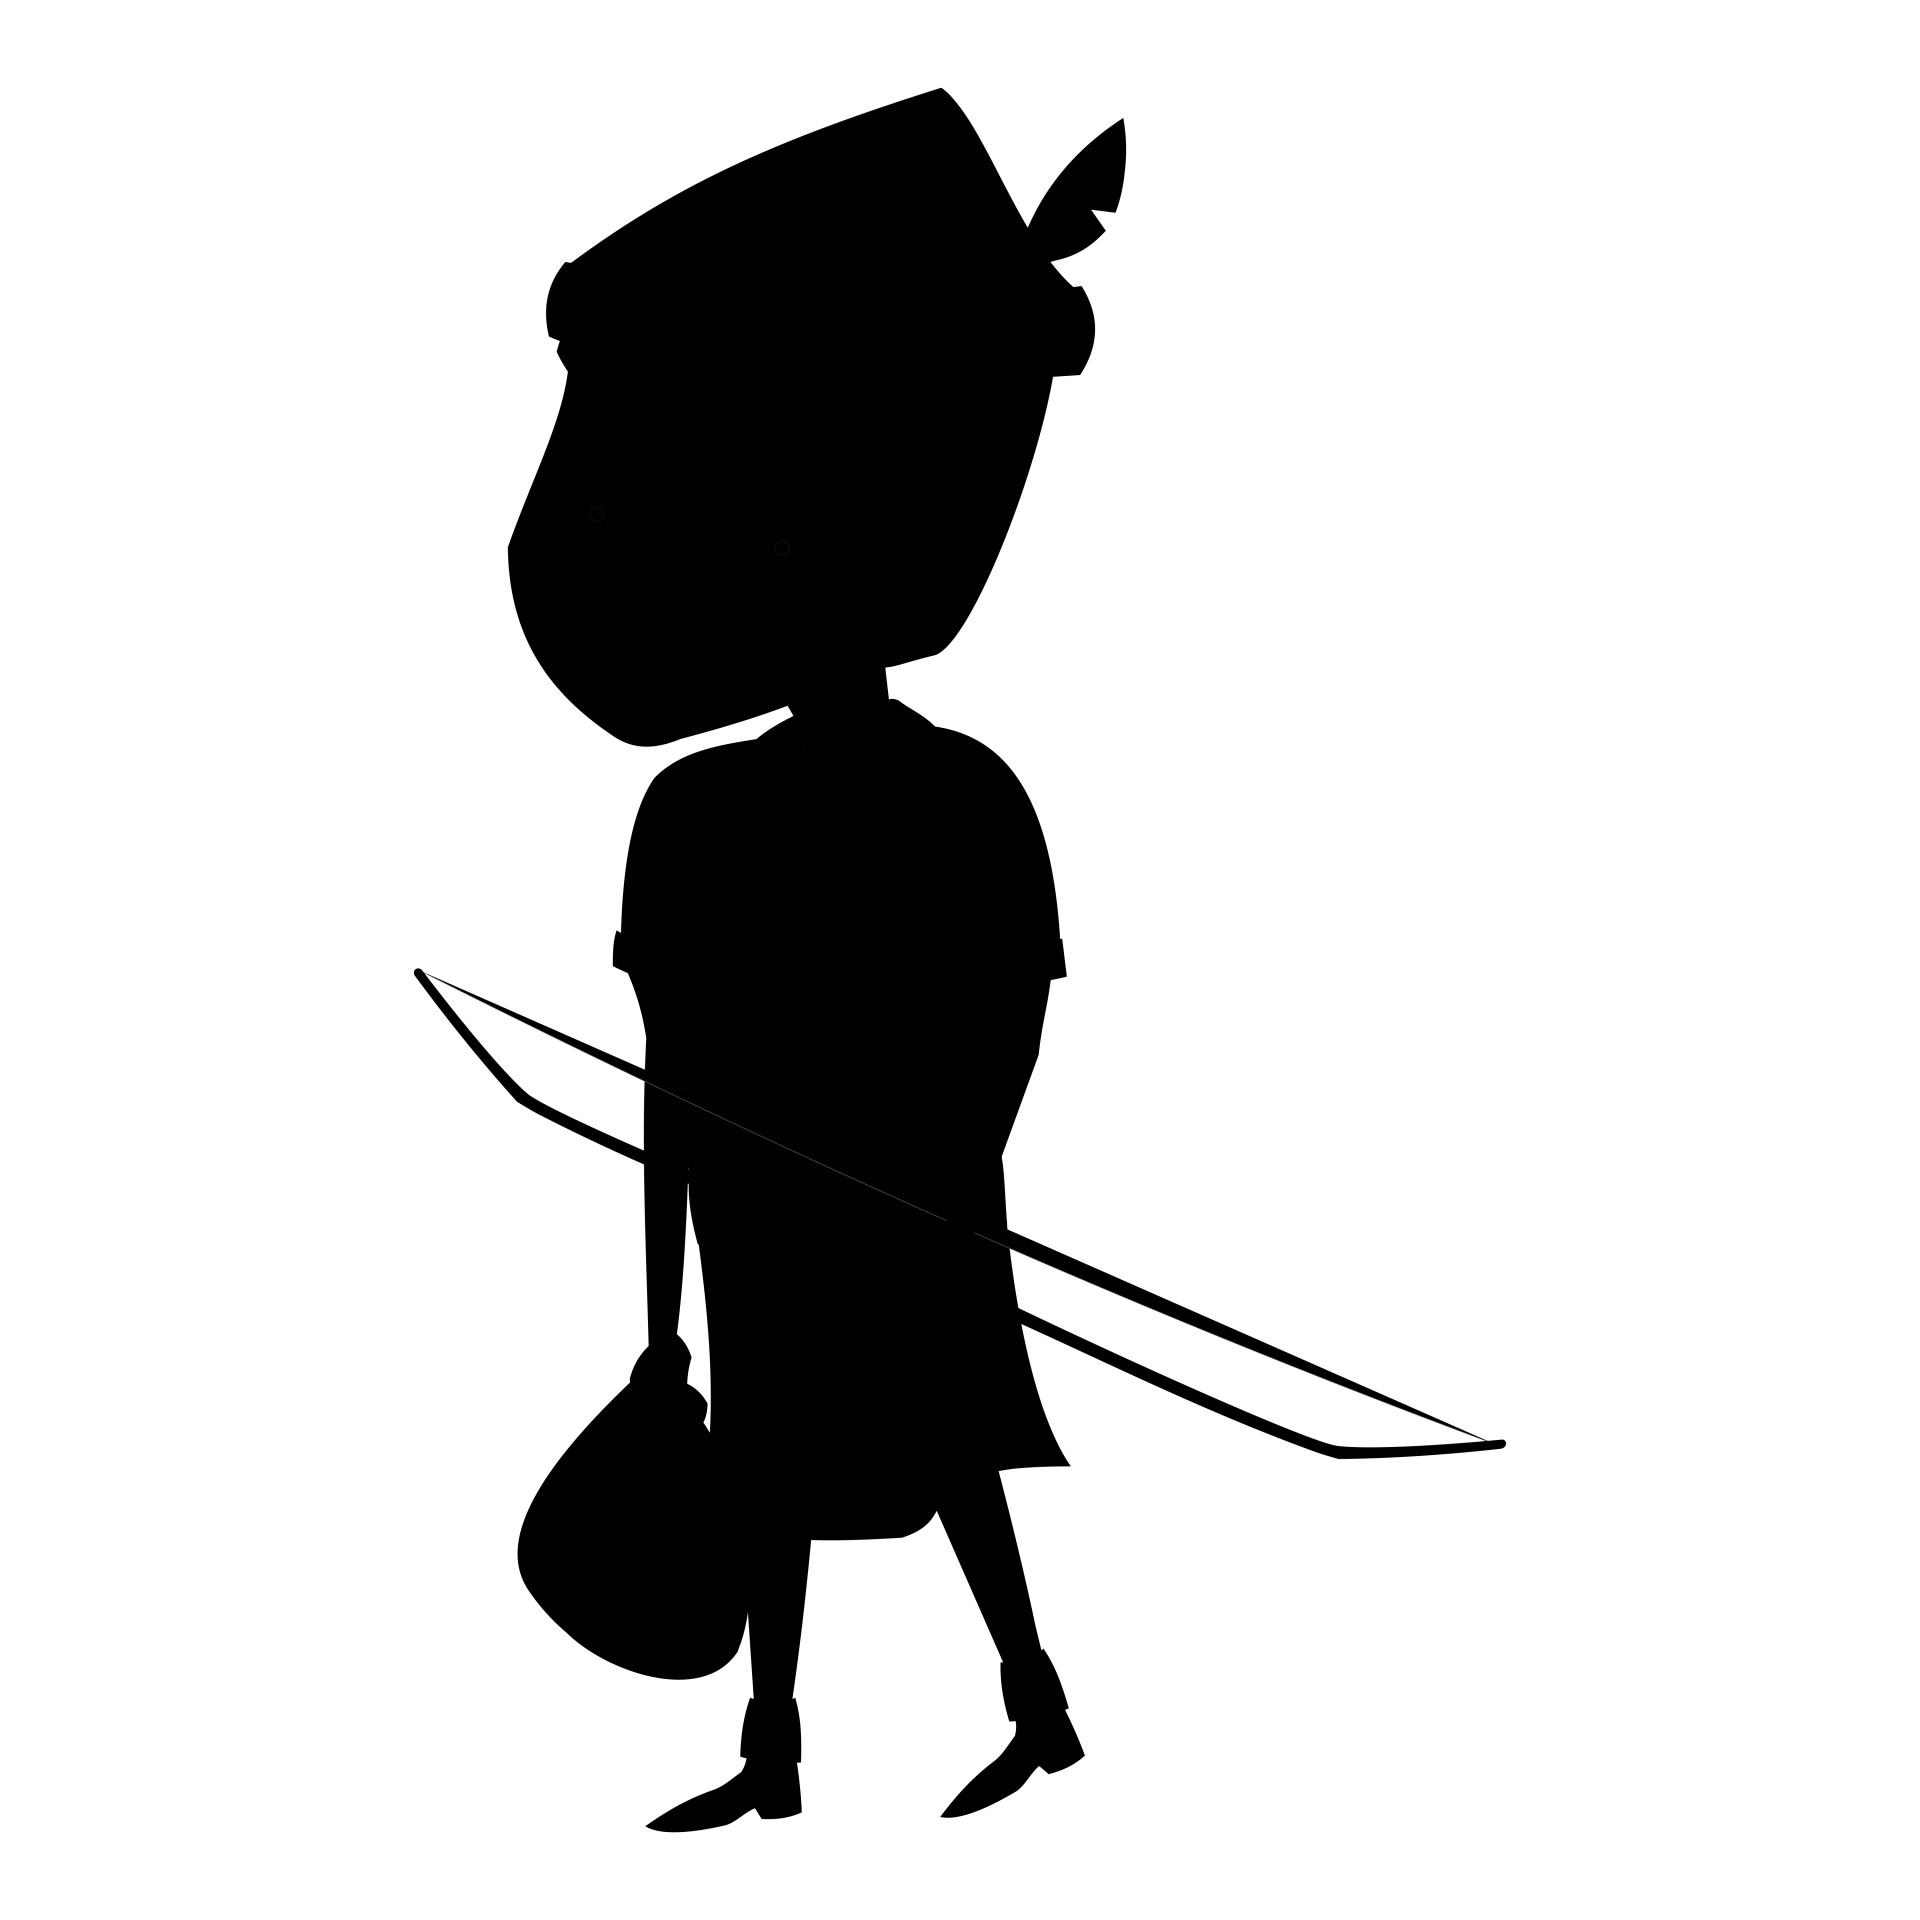 Robin Hood Disney Ausmalbilder : Robin Hood Silhouette At Getdrawings Com Free For Personal Use